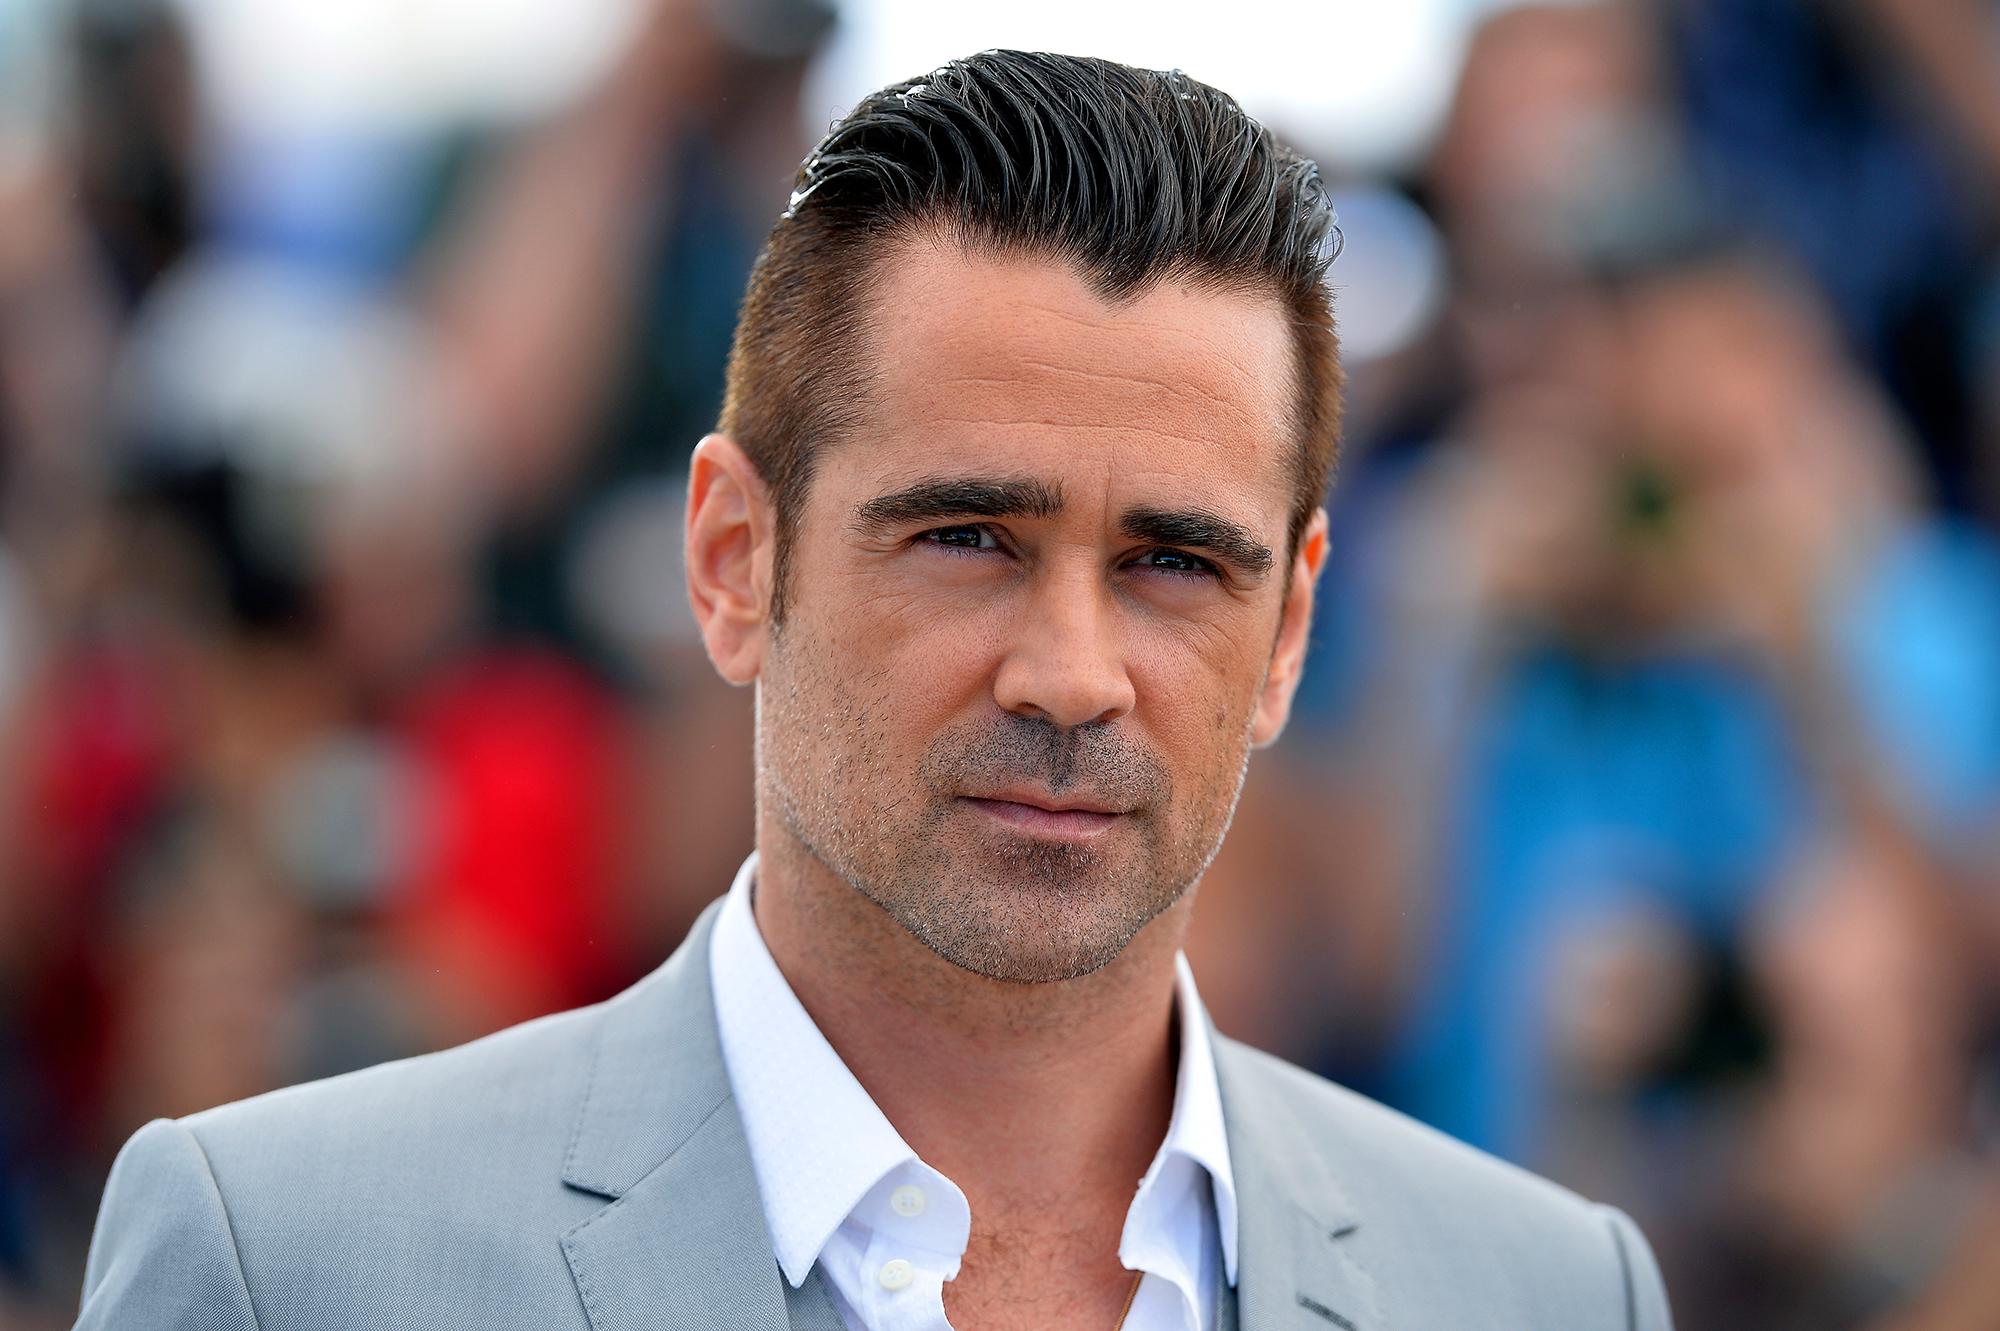 Colin Farrell Voluntarily Checks Into Rehab For Reset